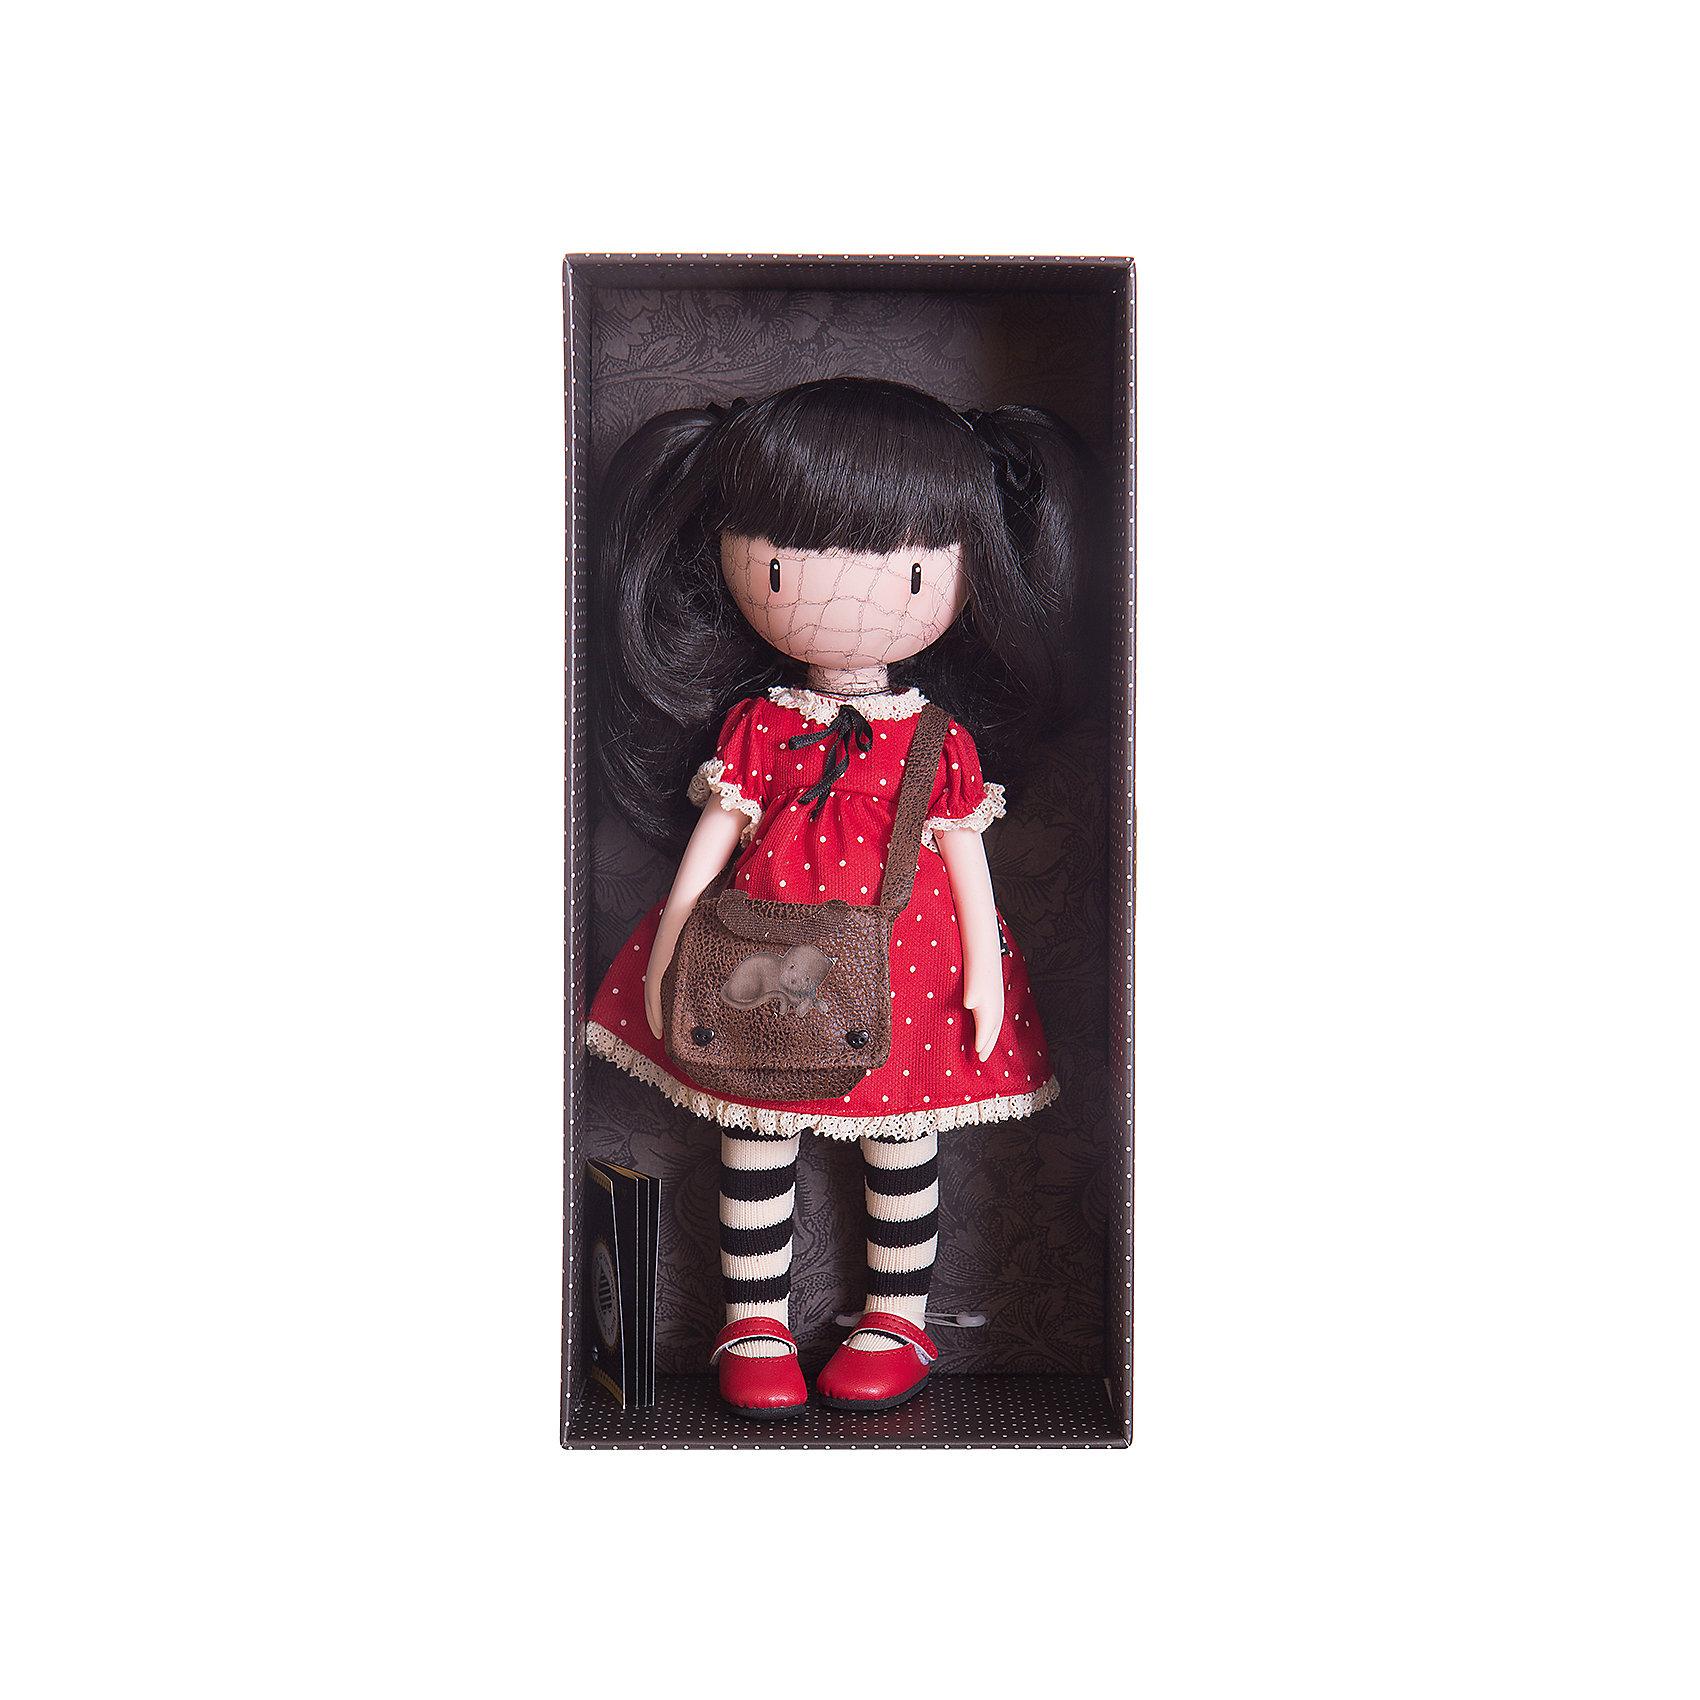 Кукла Горджусс Рубин, 32 см, Paola ReinaКлассические куклы<br><br><br>Ширина мм: 375<br>Глубина мм: 175<br>Высота мм: 105<br>Вес г: 820<br>Возраст от месяцев: 36<br>Возраст до месяцев: 144<br>Пол: Женский<br>Возраст: Детский<br>SKU: 6671044